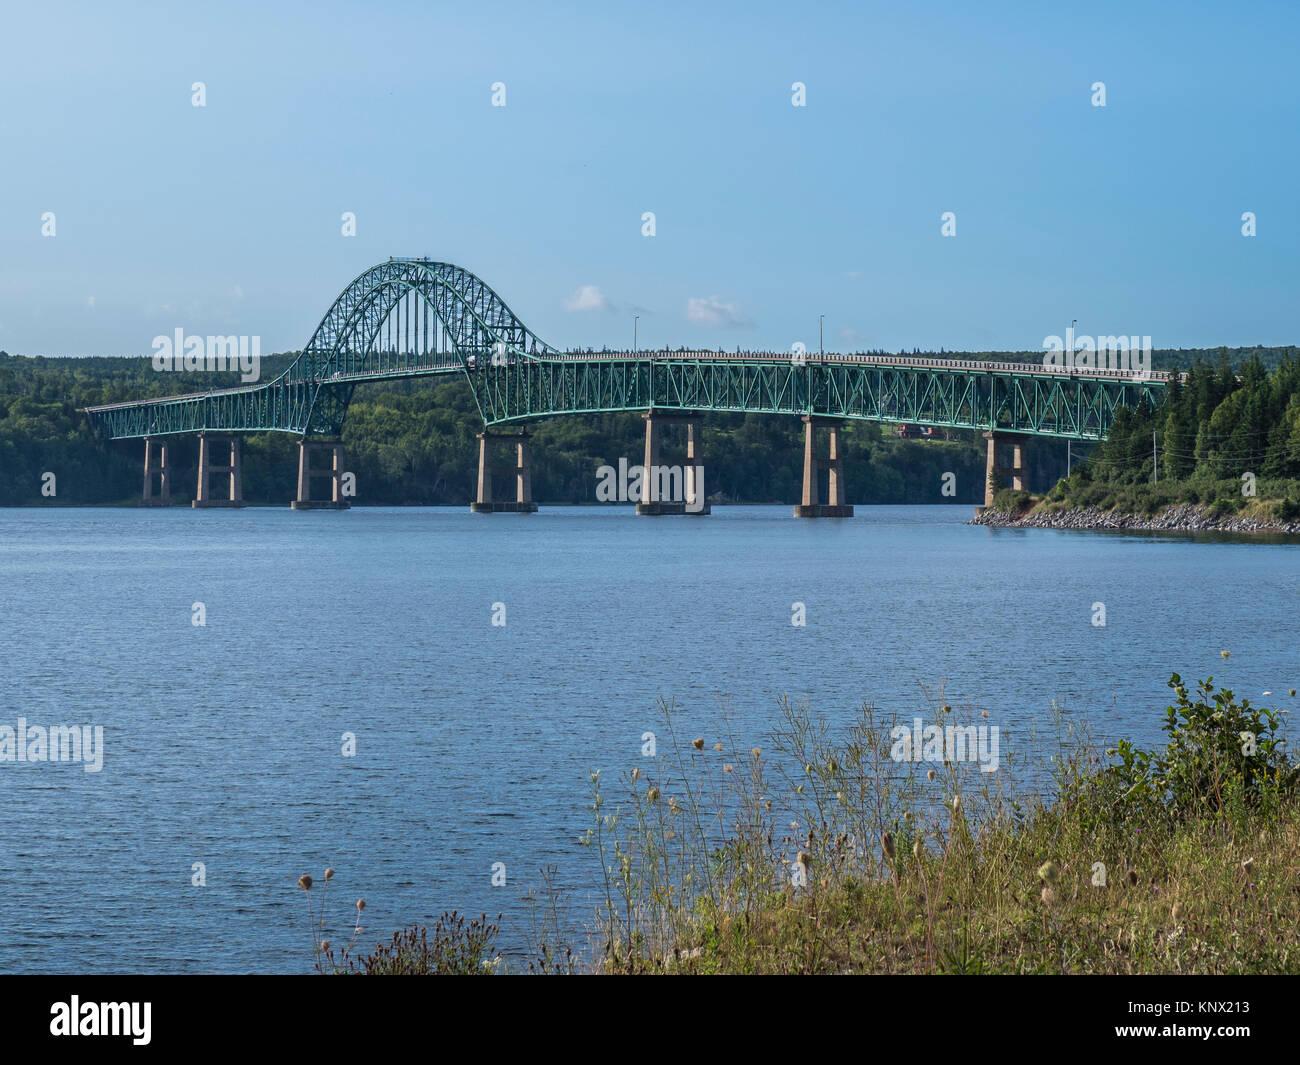 Seal Island Bridge, North Sydney, Nova Scotia, Canada. - Stock Image